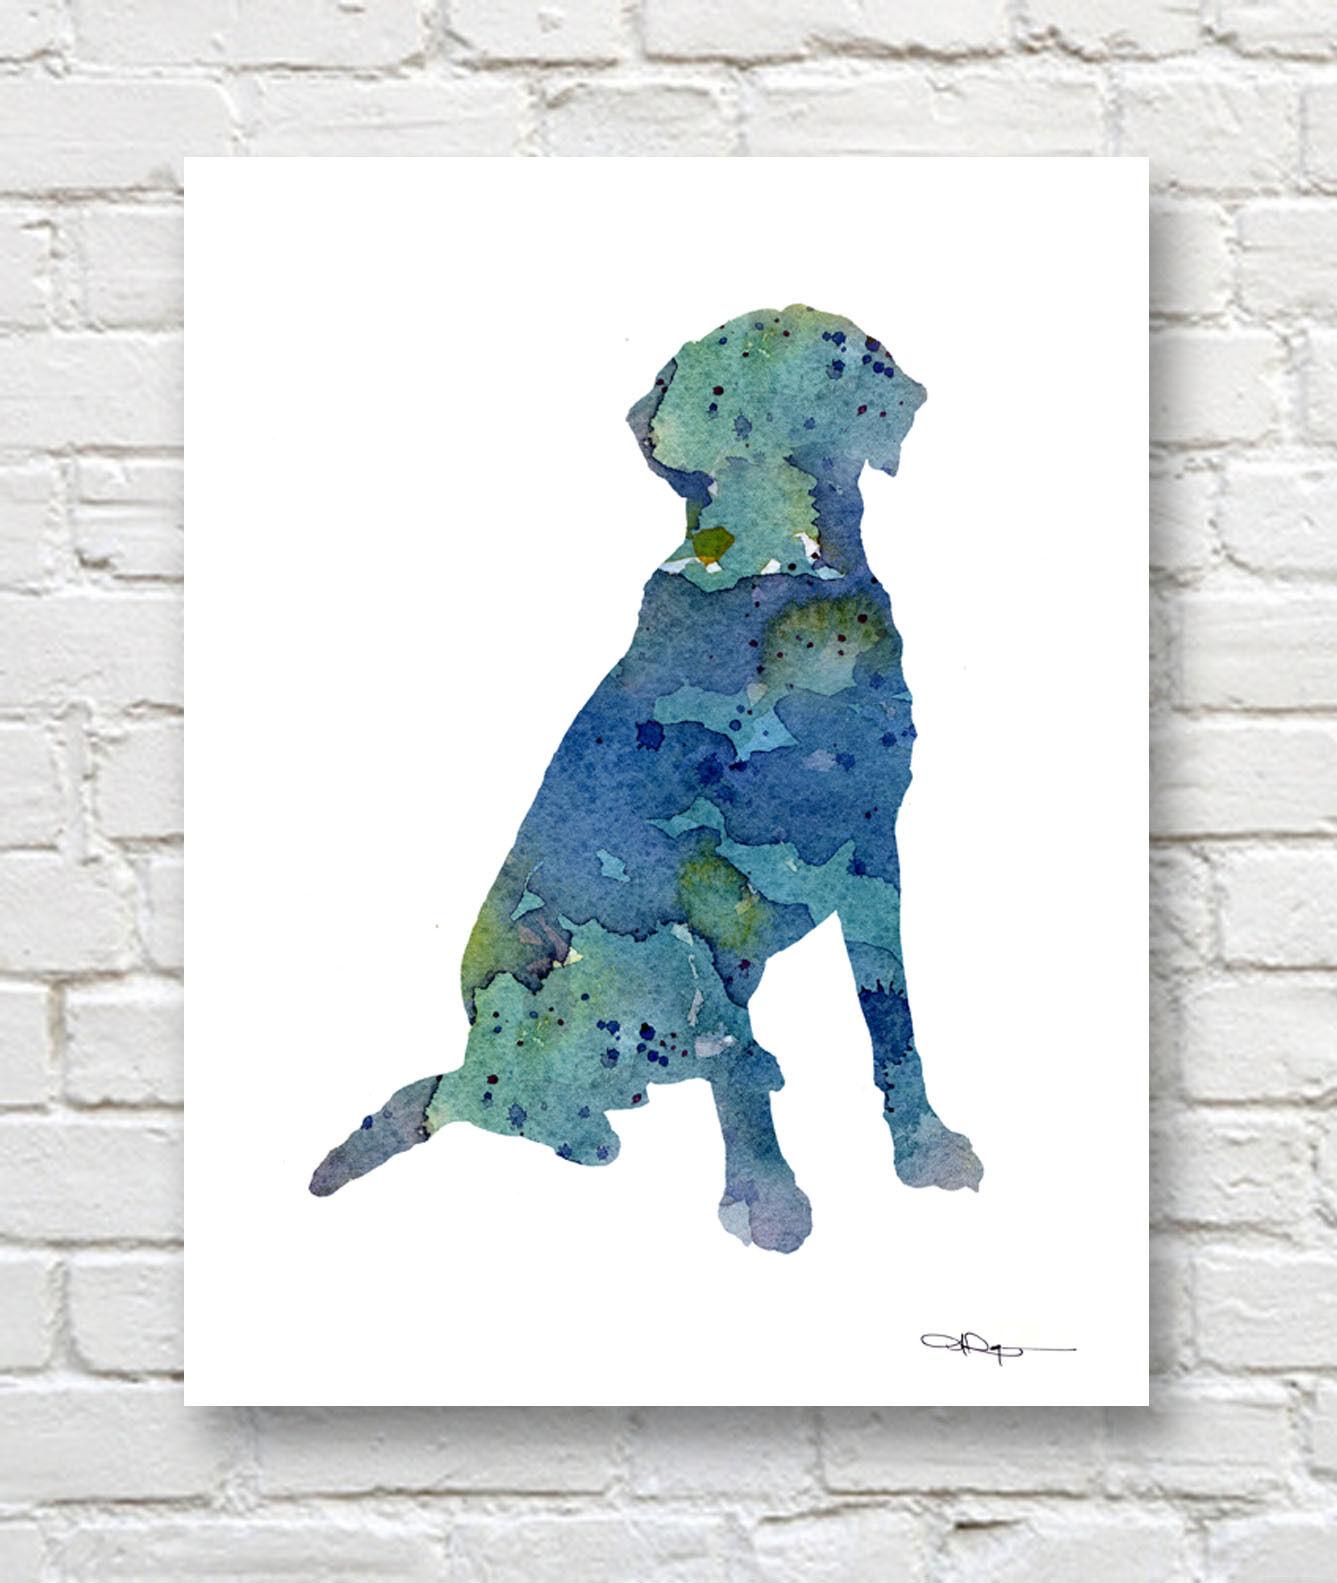 Chesapeake Bay Retriever Art Print Sepia Watercolor Painting by Artist DJR